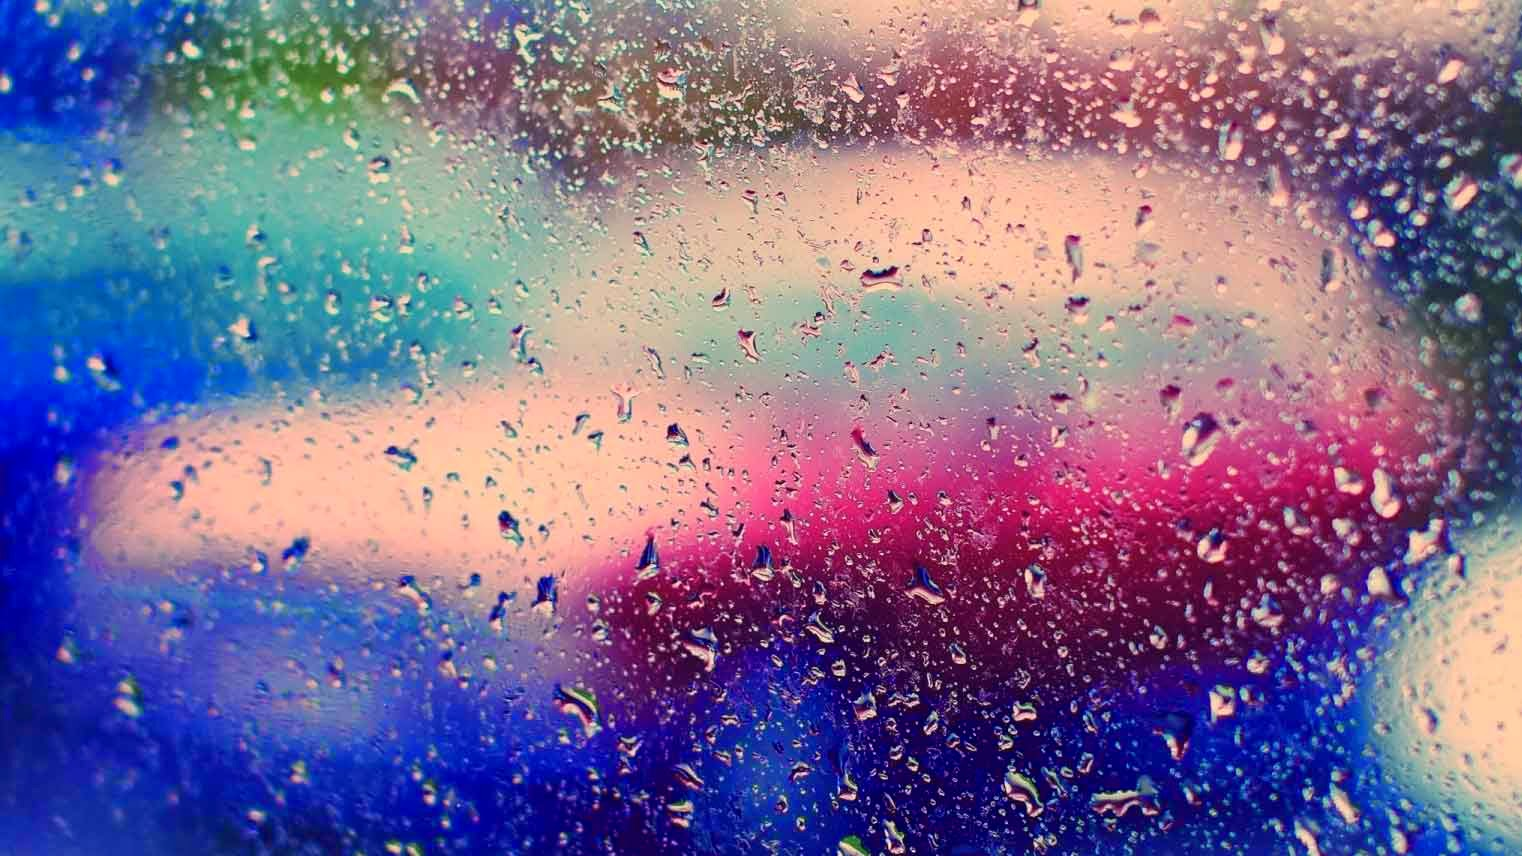 Raindrops Falling From The Sky Wallpaper 15 Raindrop Hd Psd Images Water Drop Desktop Wallpaper